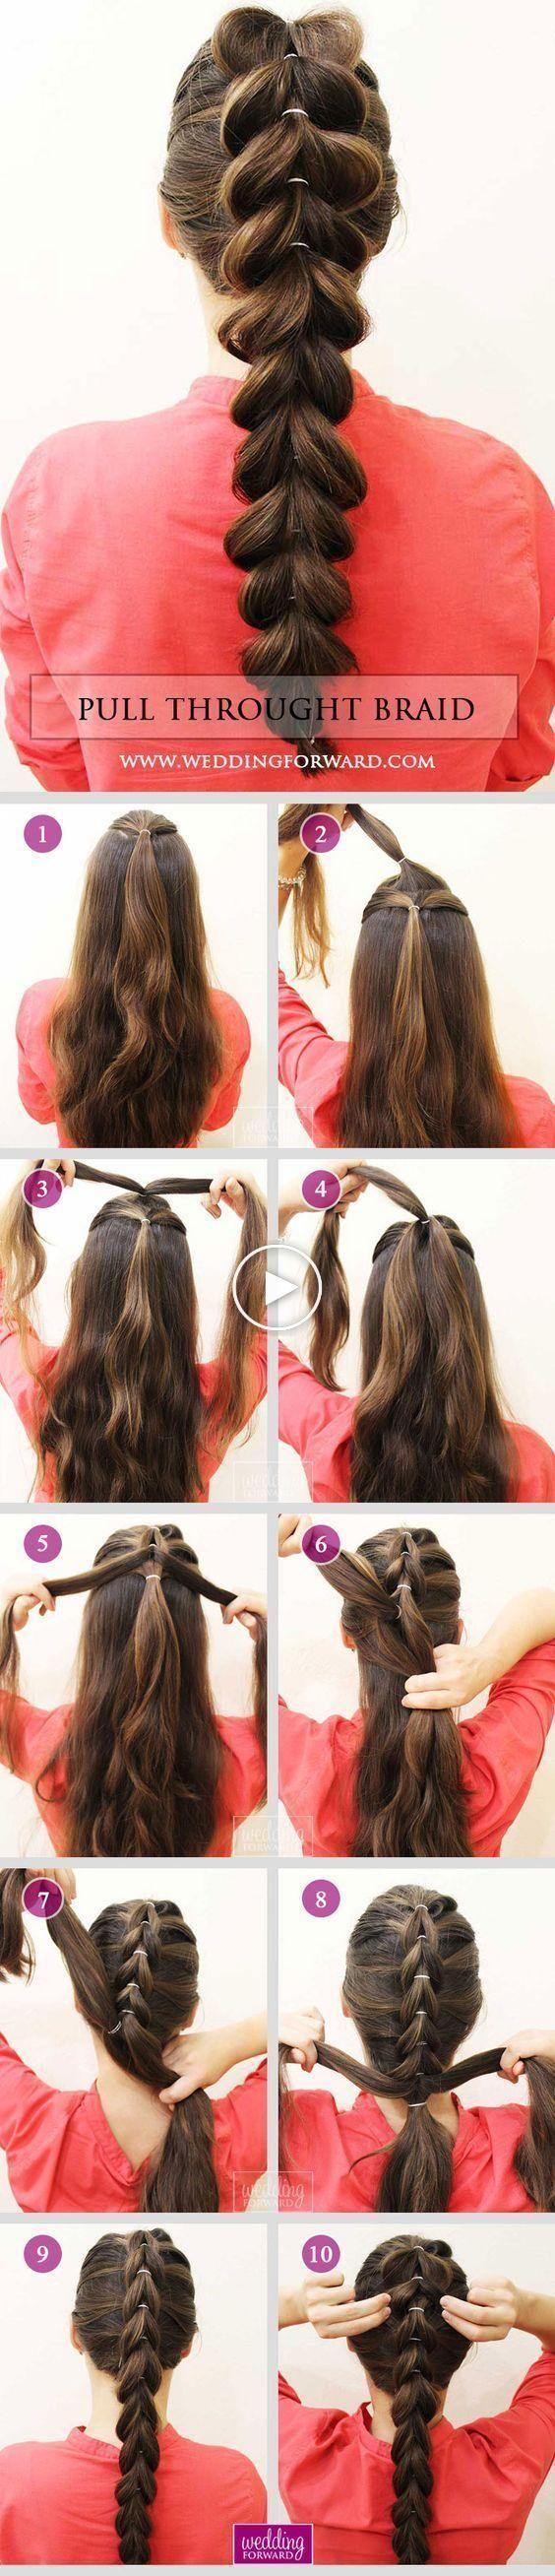 EASY 5 MINUTES CLEAN HAIR STYLE IDEAS FOR WOMEN – casa